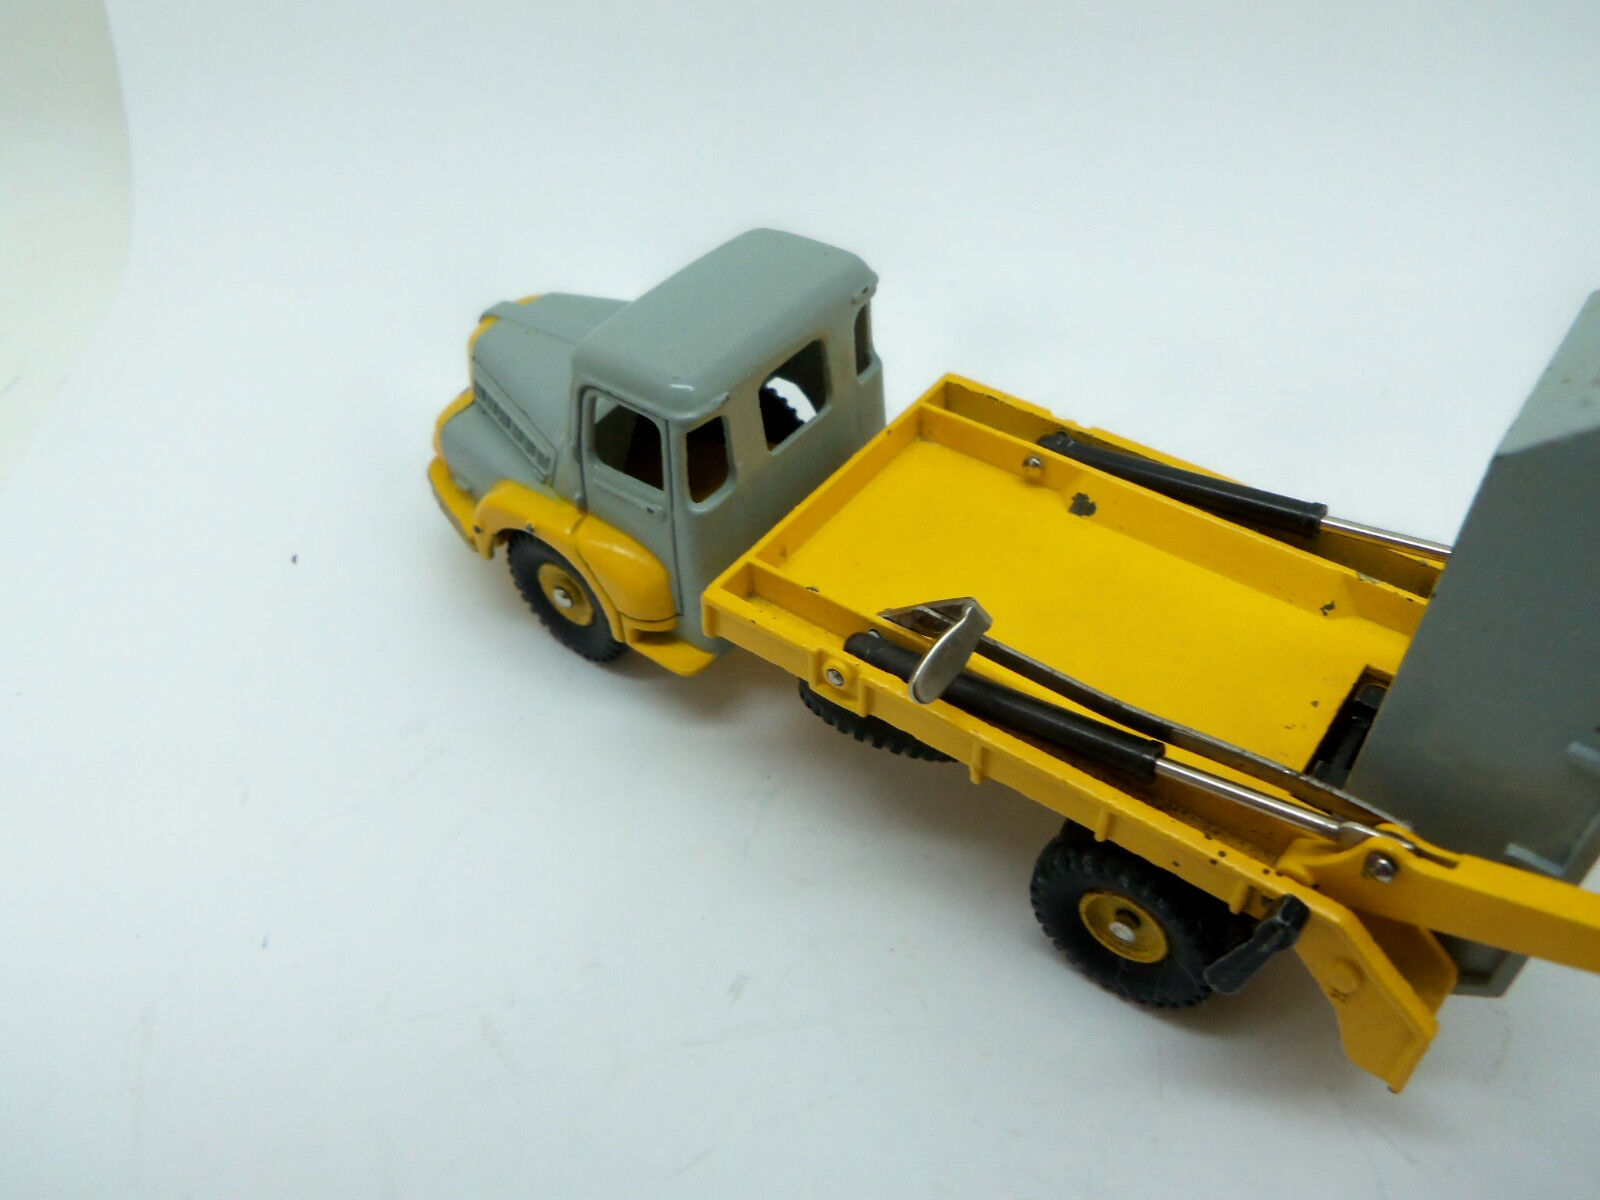 FRENCH DINKY SUPERTOYS SUPERTOYS SUPERTOYS 895 Truck UNIC MULTIBENNE MARREL-VN Comme neuf-pas atlas | Bradées  | D'adopter La Technologie De Pointe  | Moderne  6a470b